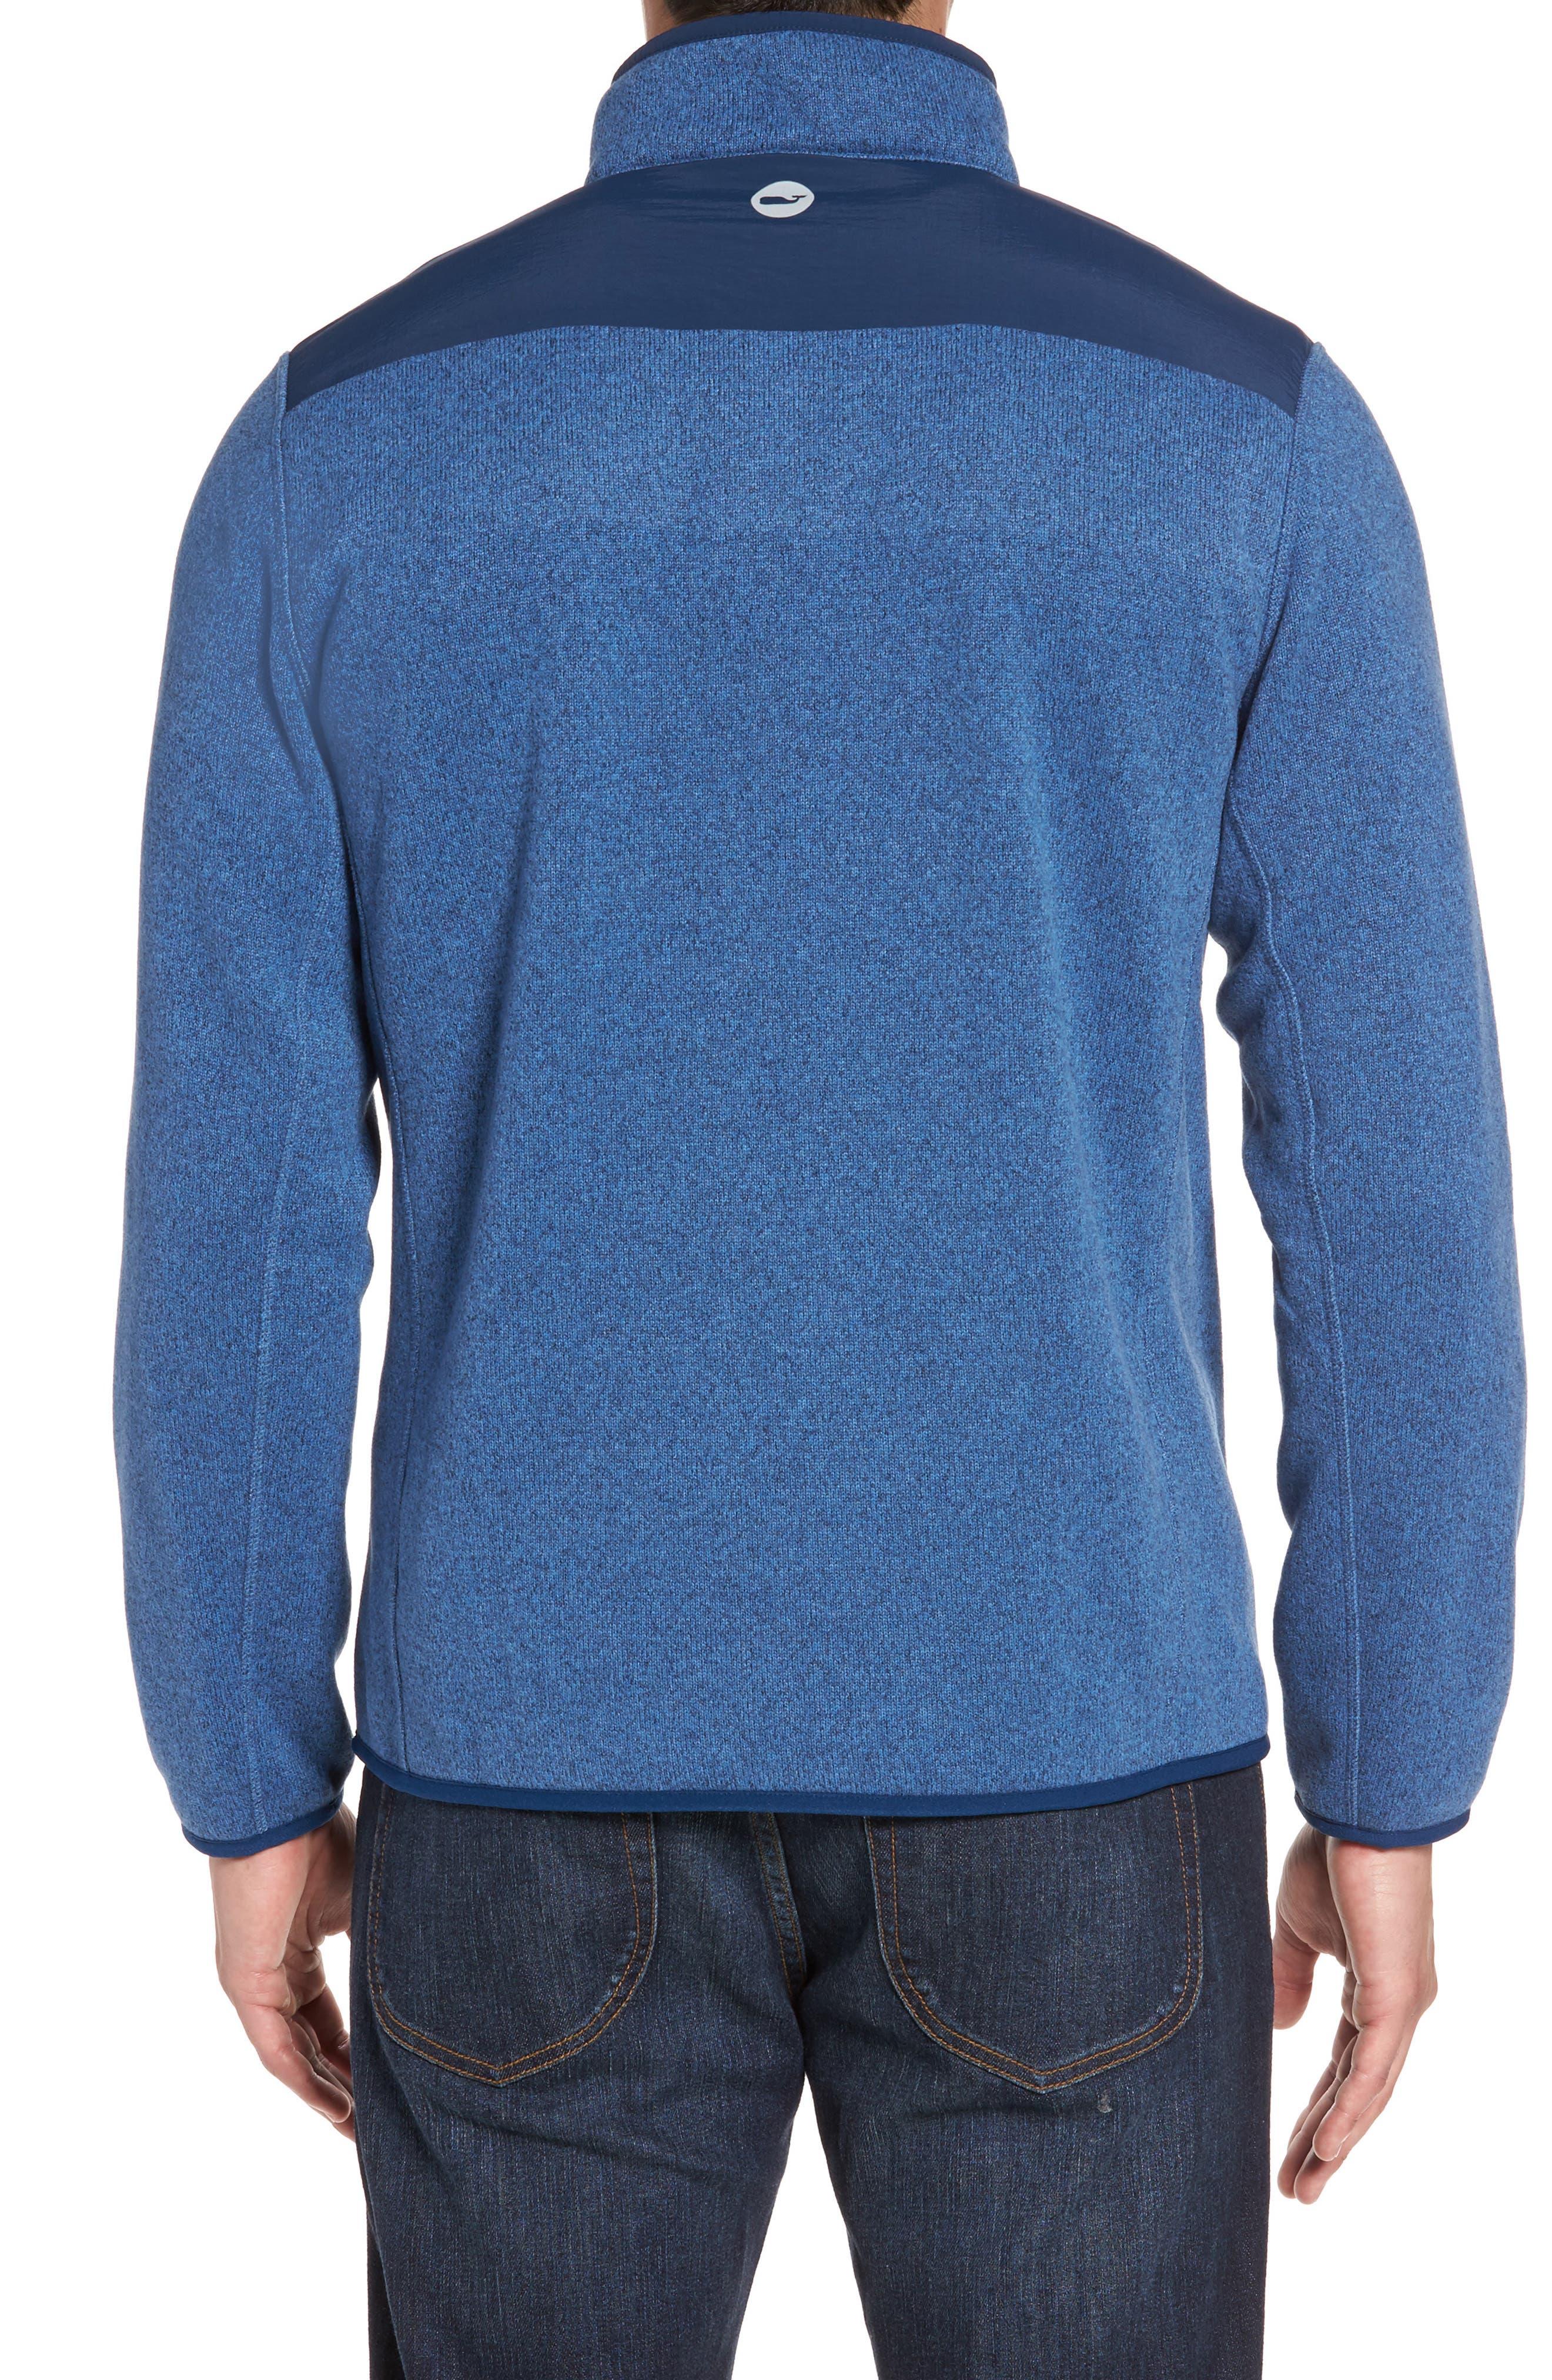 Alternate Image 2  - vineyard vines Shep Quarter Zip Fleece Sweater